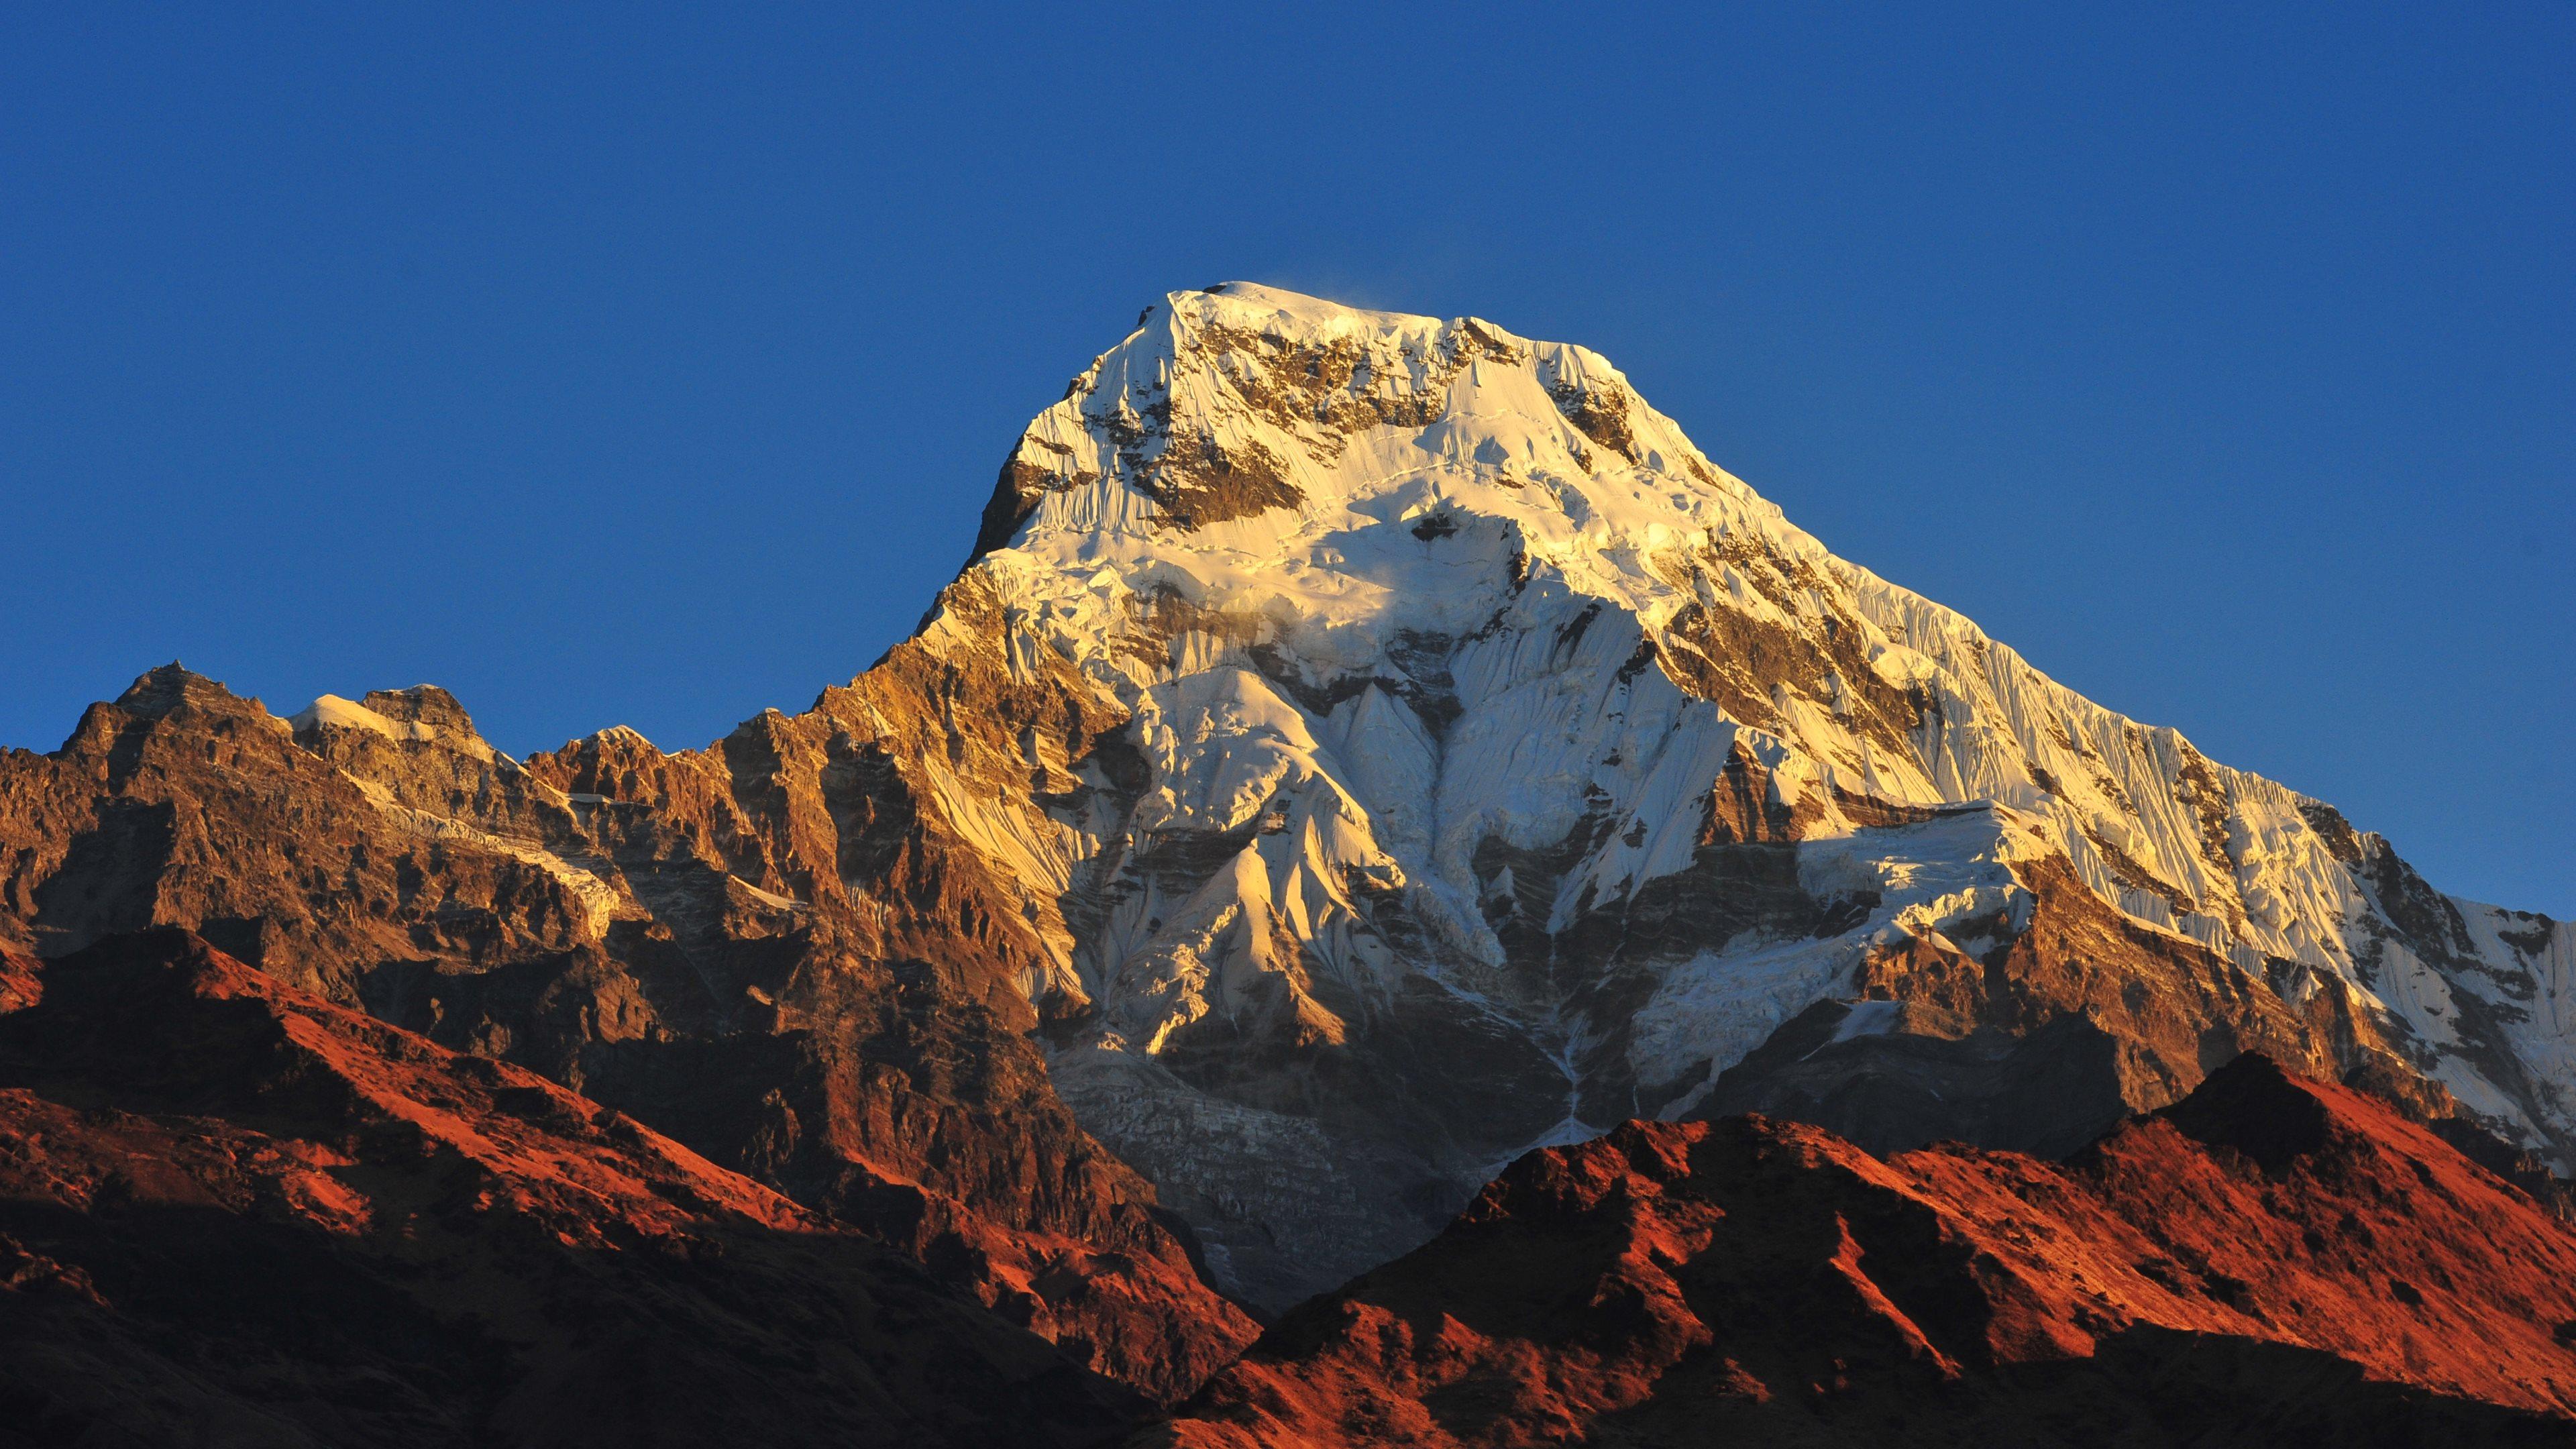 Minimalism Mountain Peak Full Hd Wallpaper: 2048x2048 Annapurna Massif Mountain Range Nepal 4k Ipad